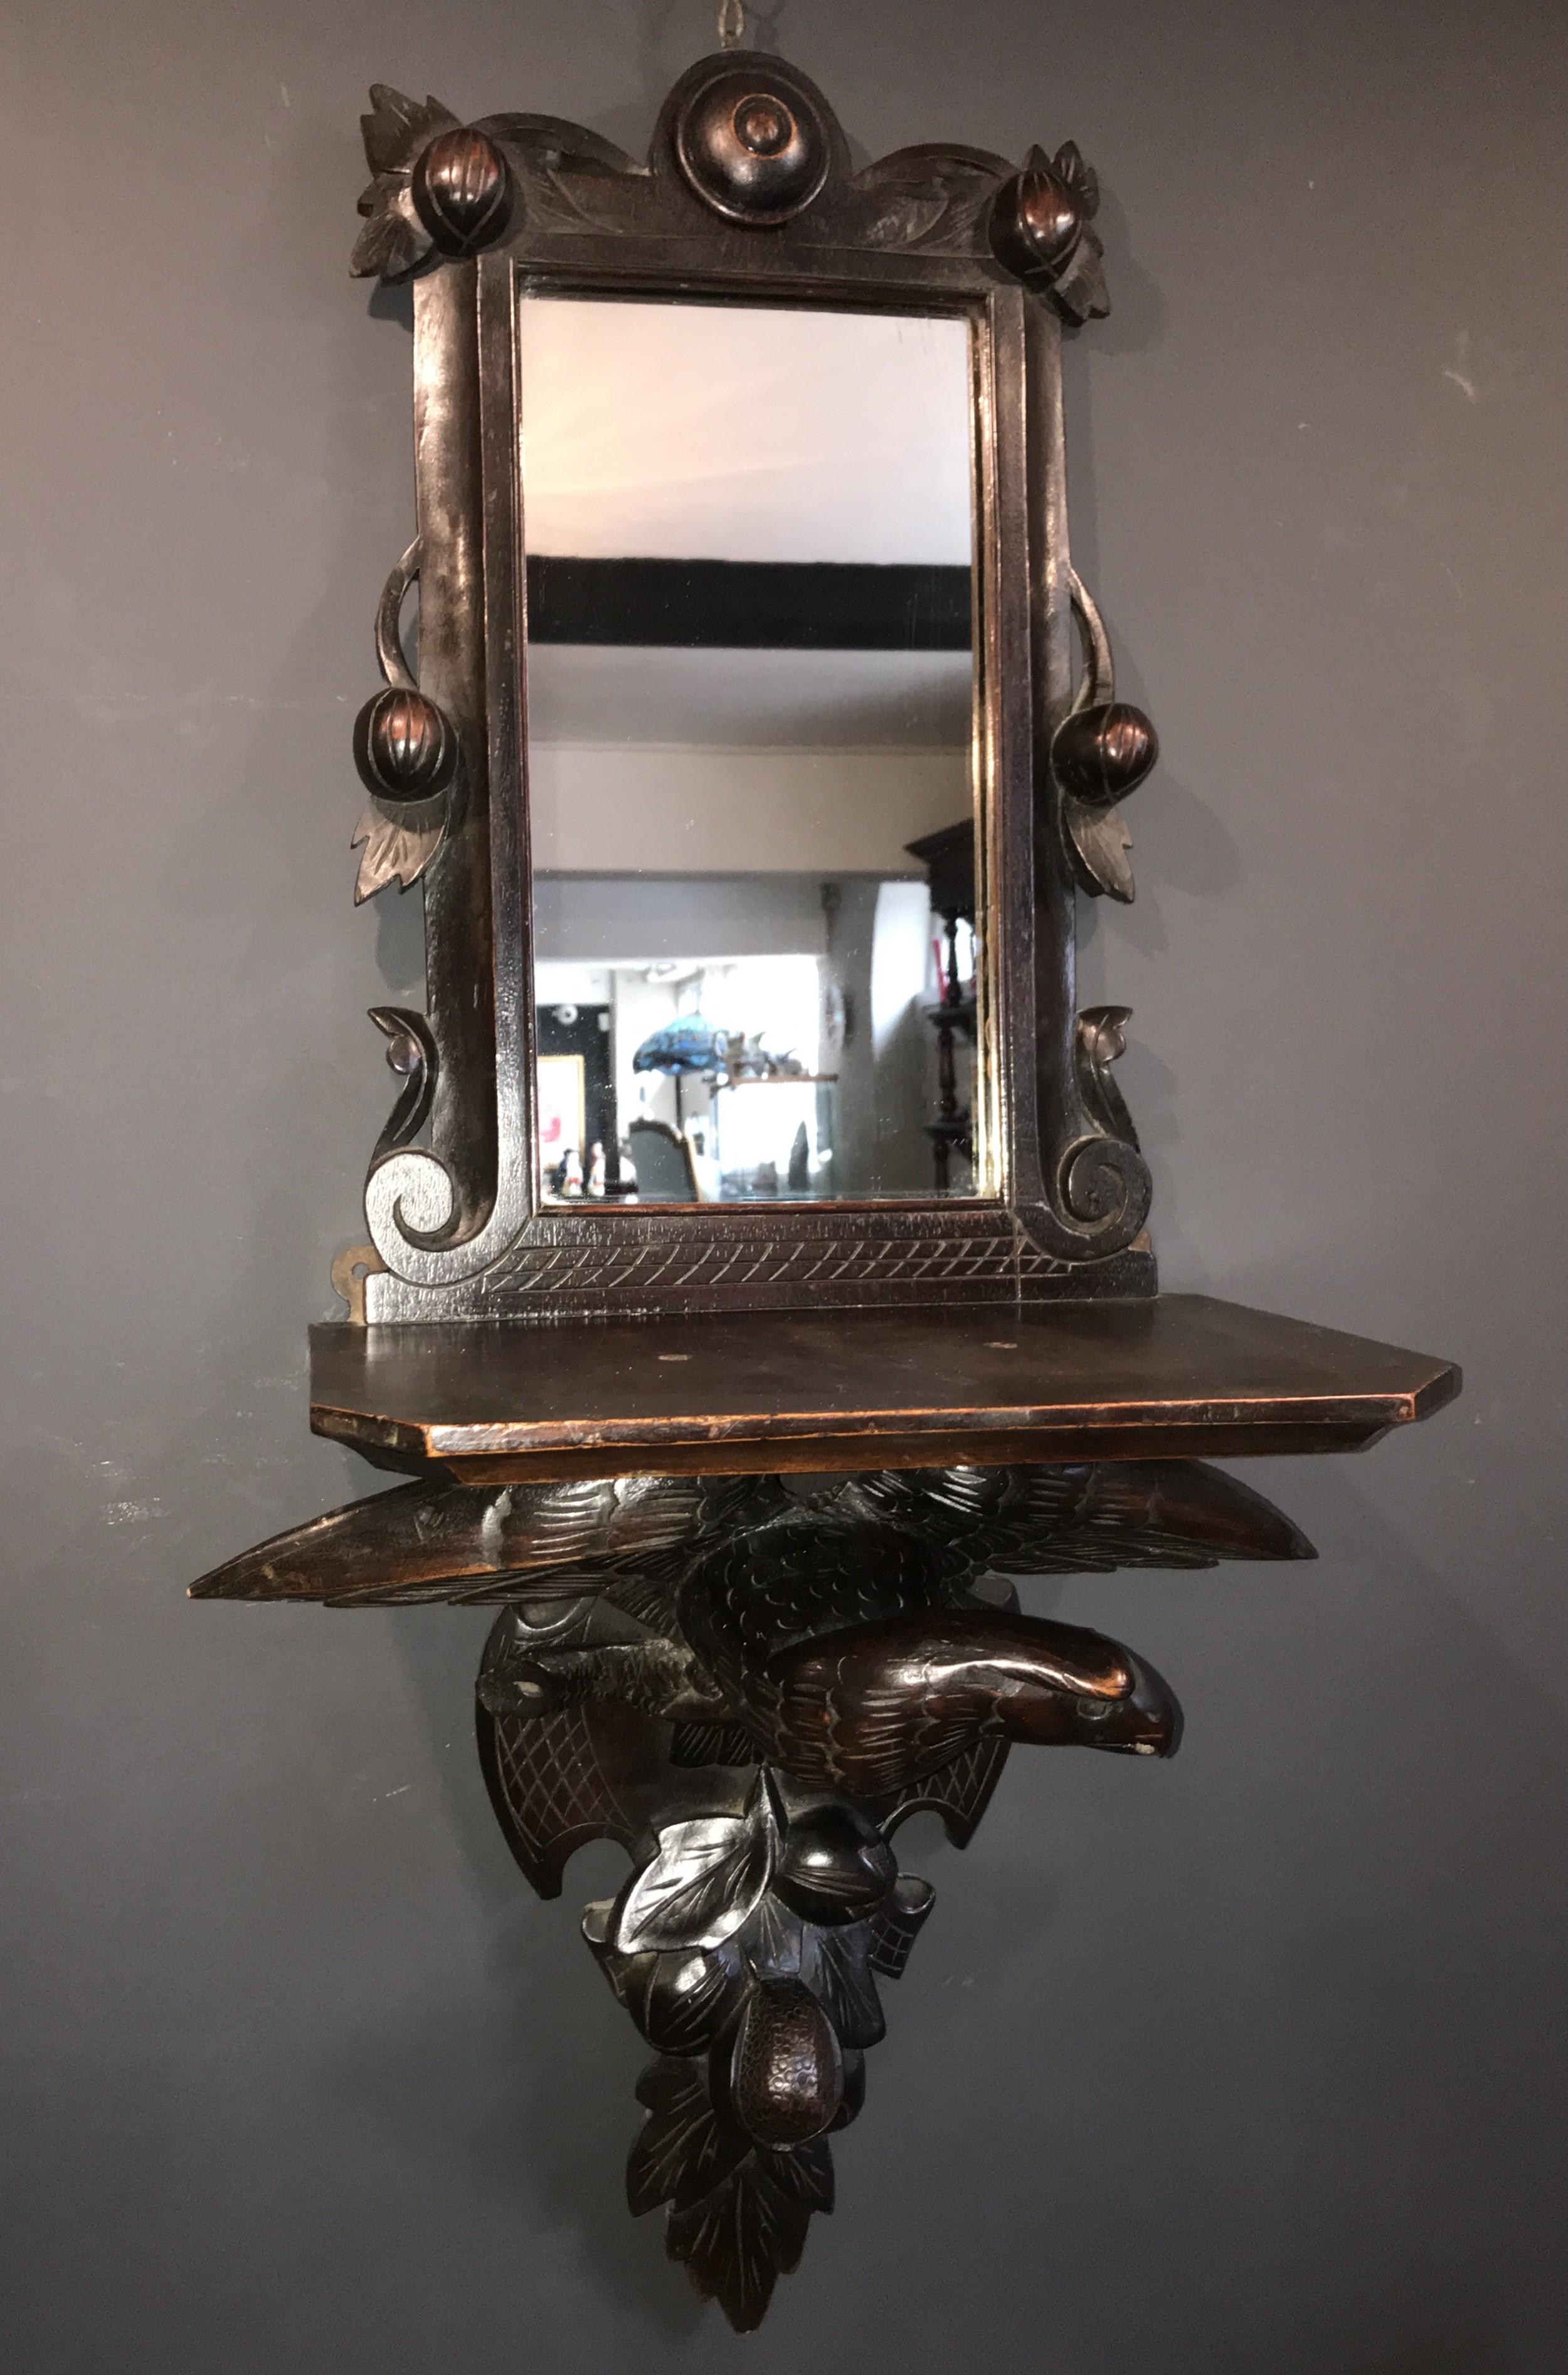 a walnut mirrored backed bracket shelf supported by a spread eagle